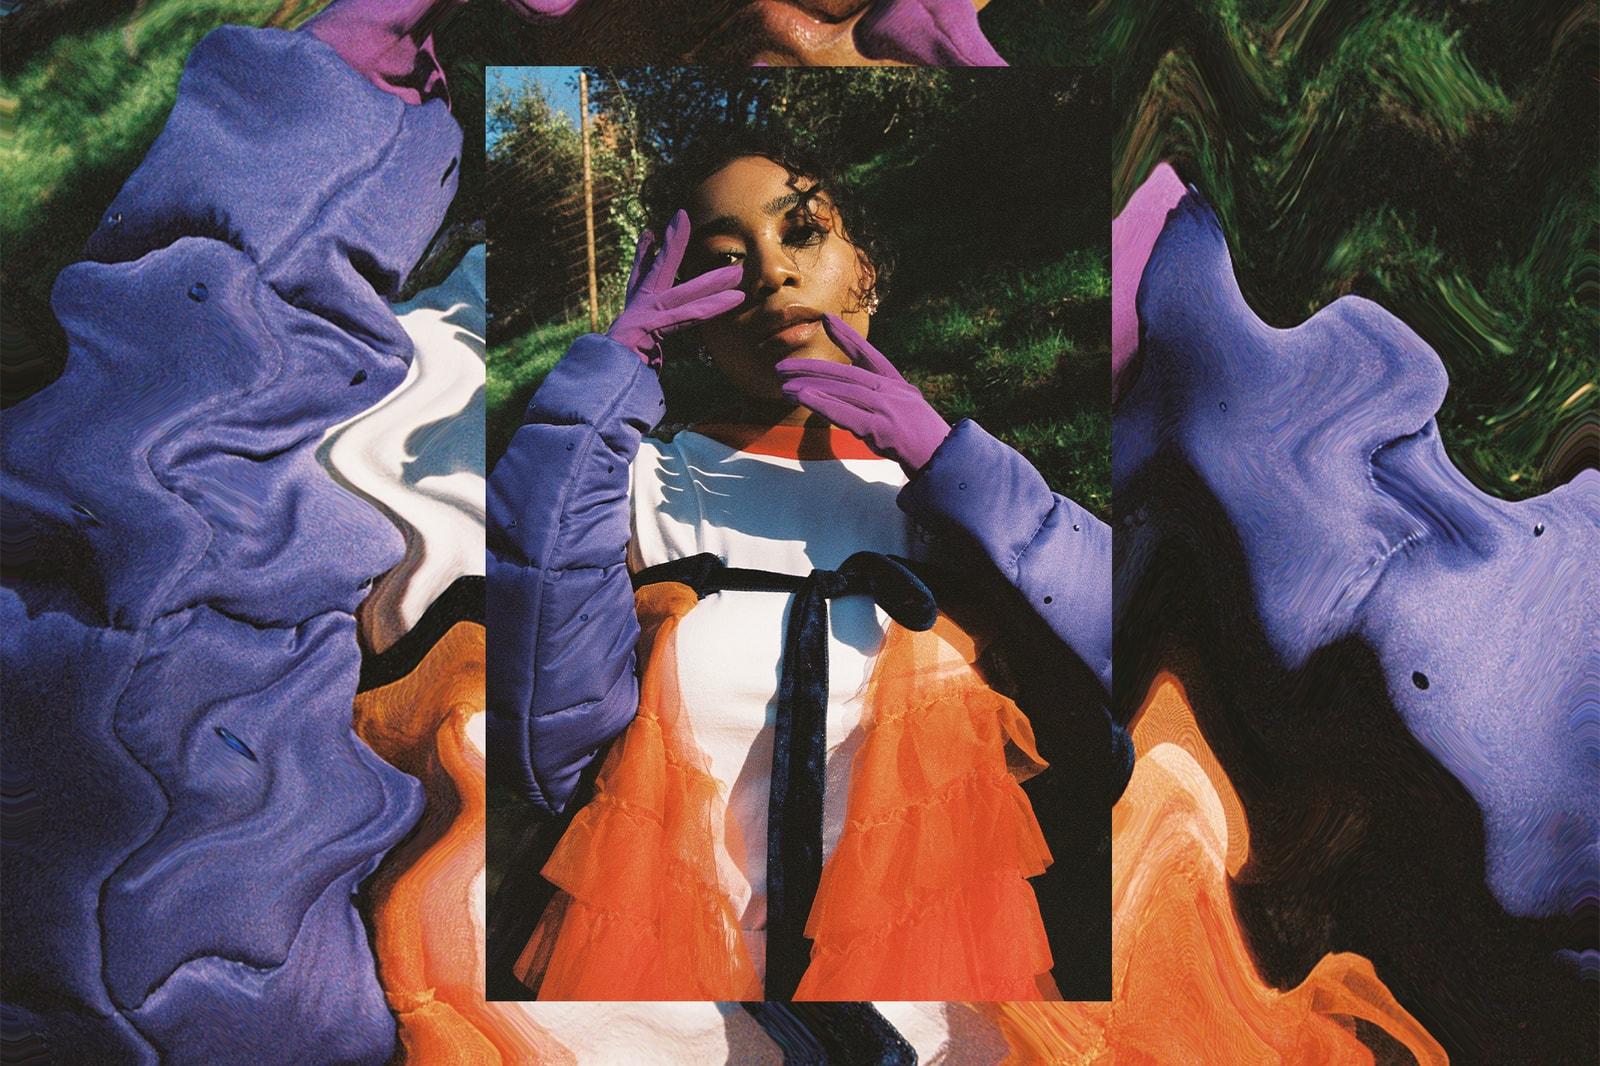 UMI R&B Soul Japanese African American Artist Introspect Reimagined EP Artist Singer Musician